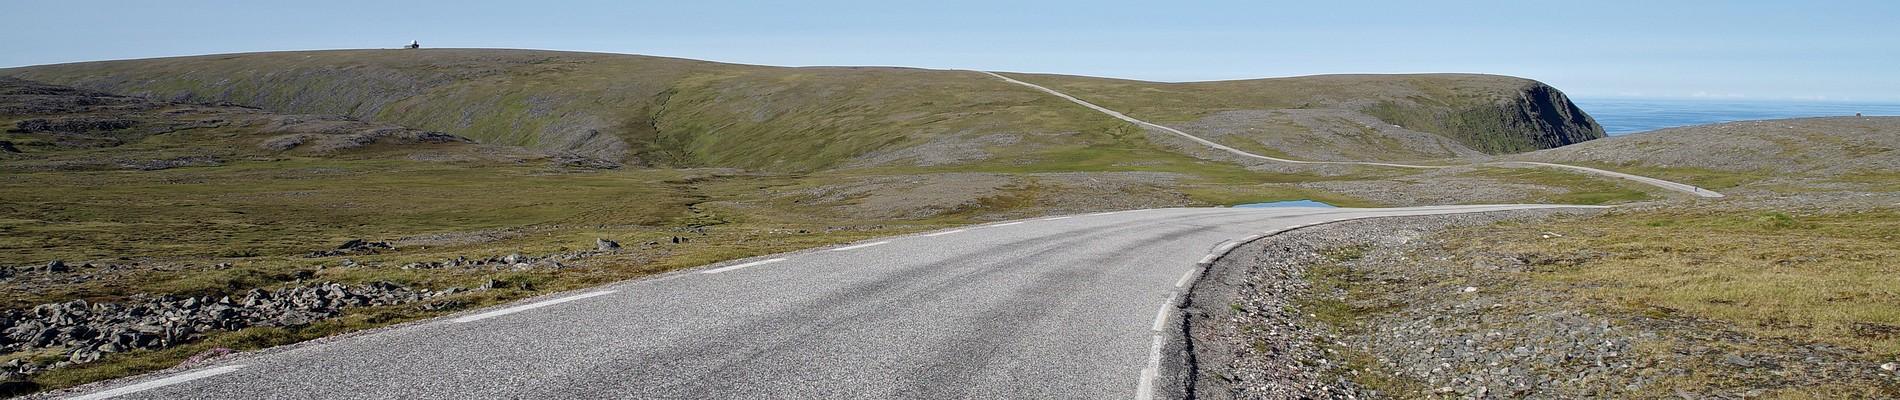 Ankunft am Nordkap